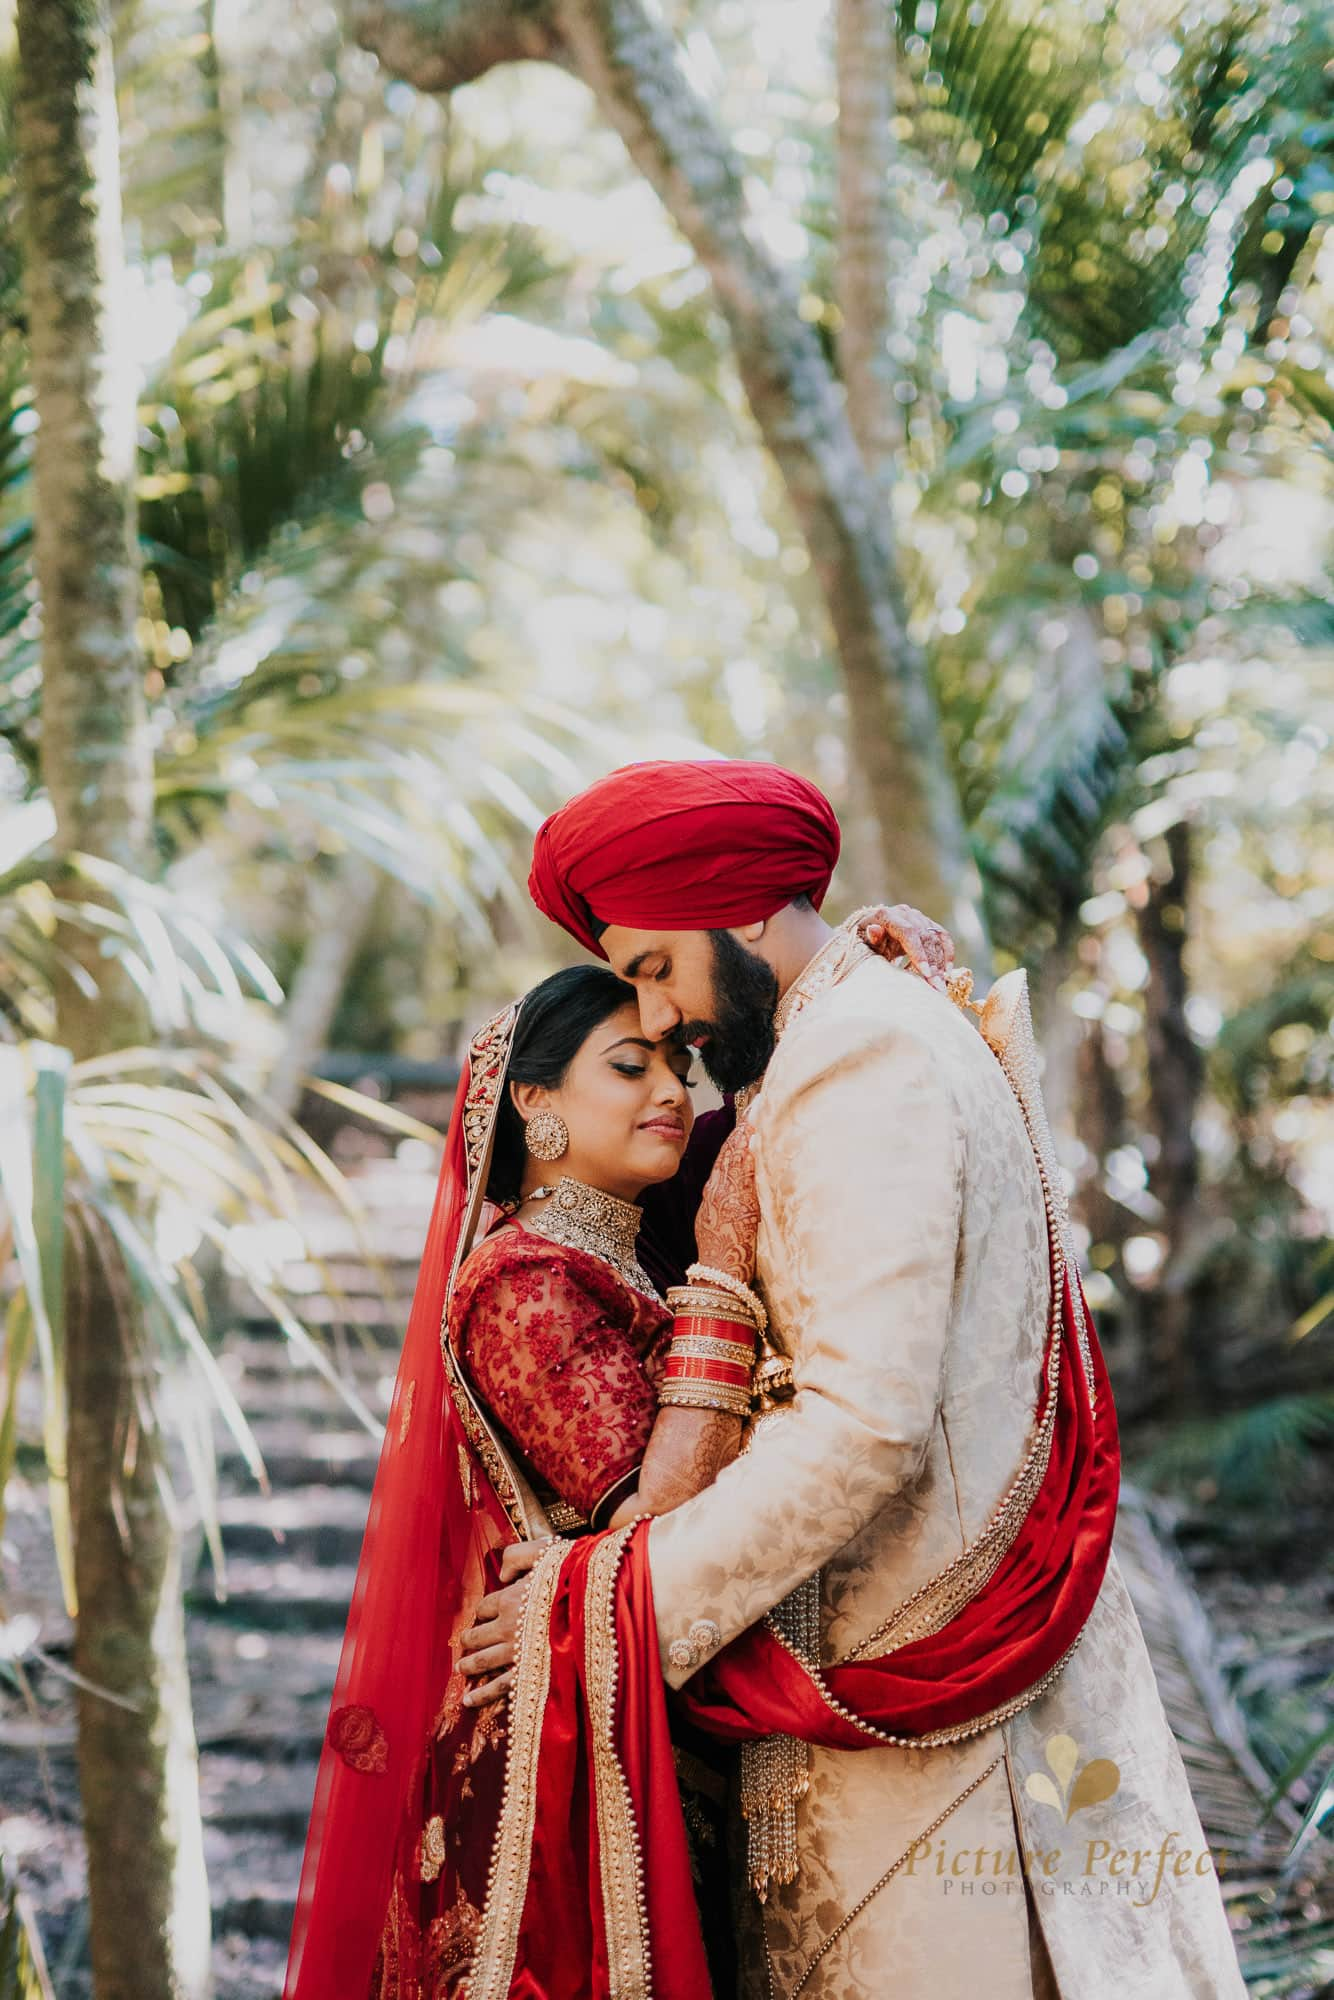 Niroshi Auckland Indian Wedding Day 3 0197